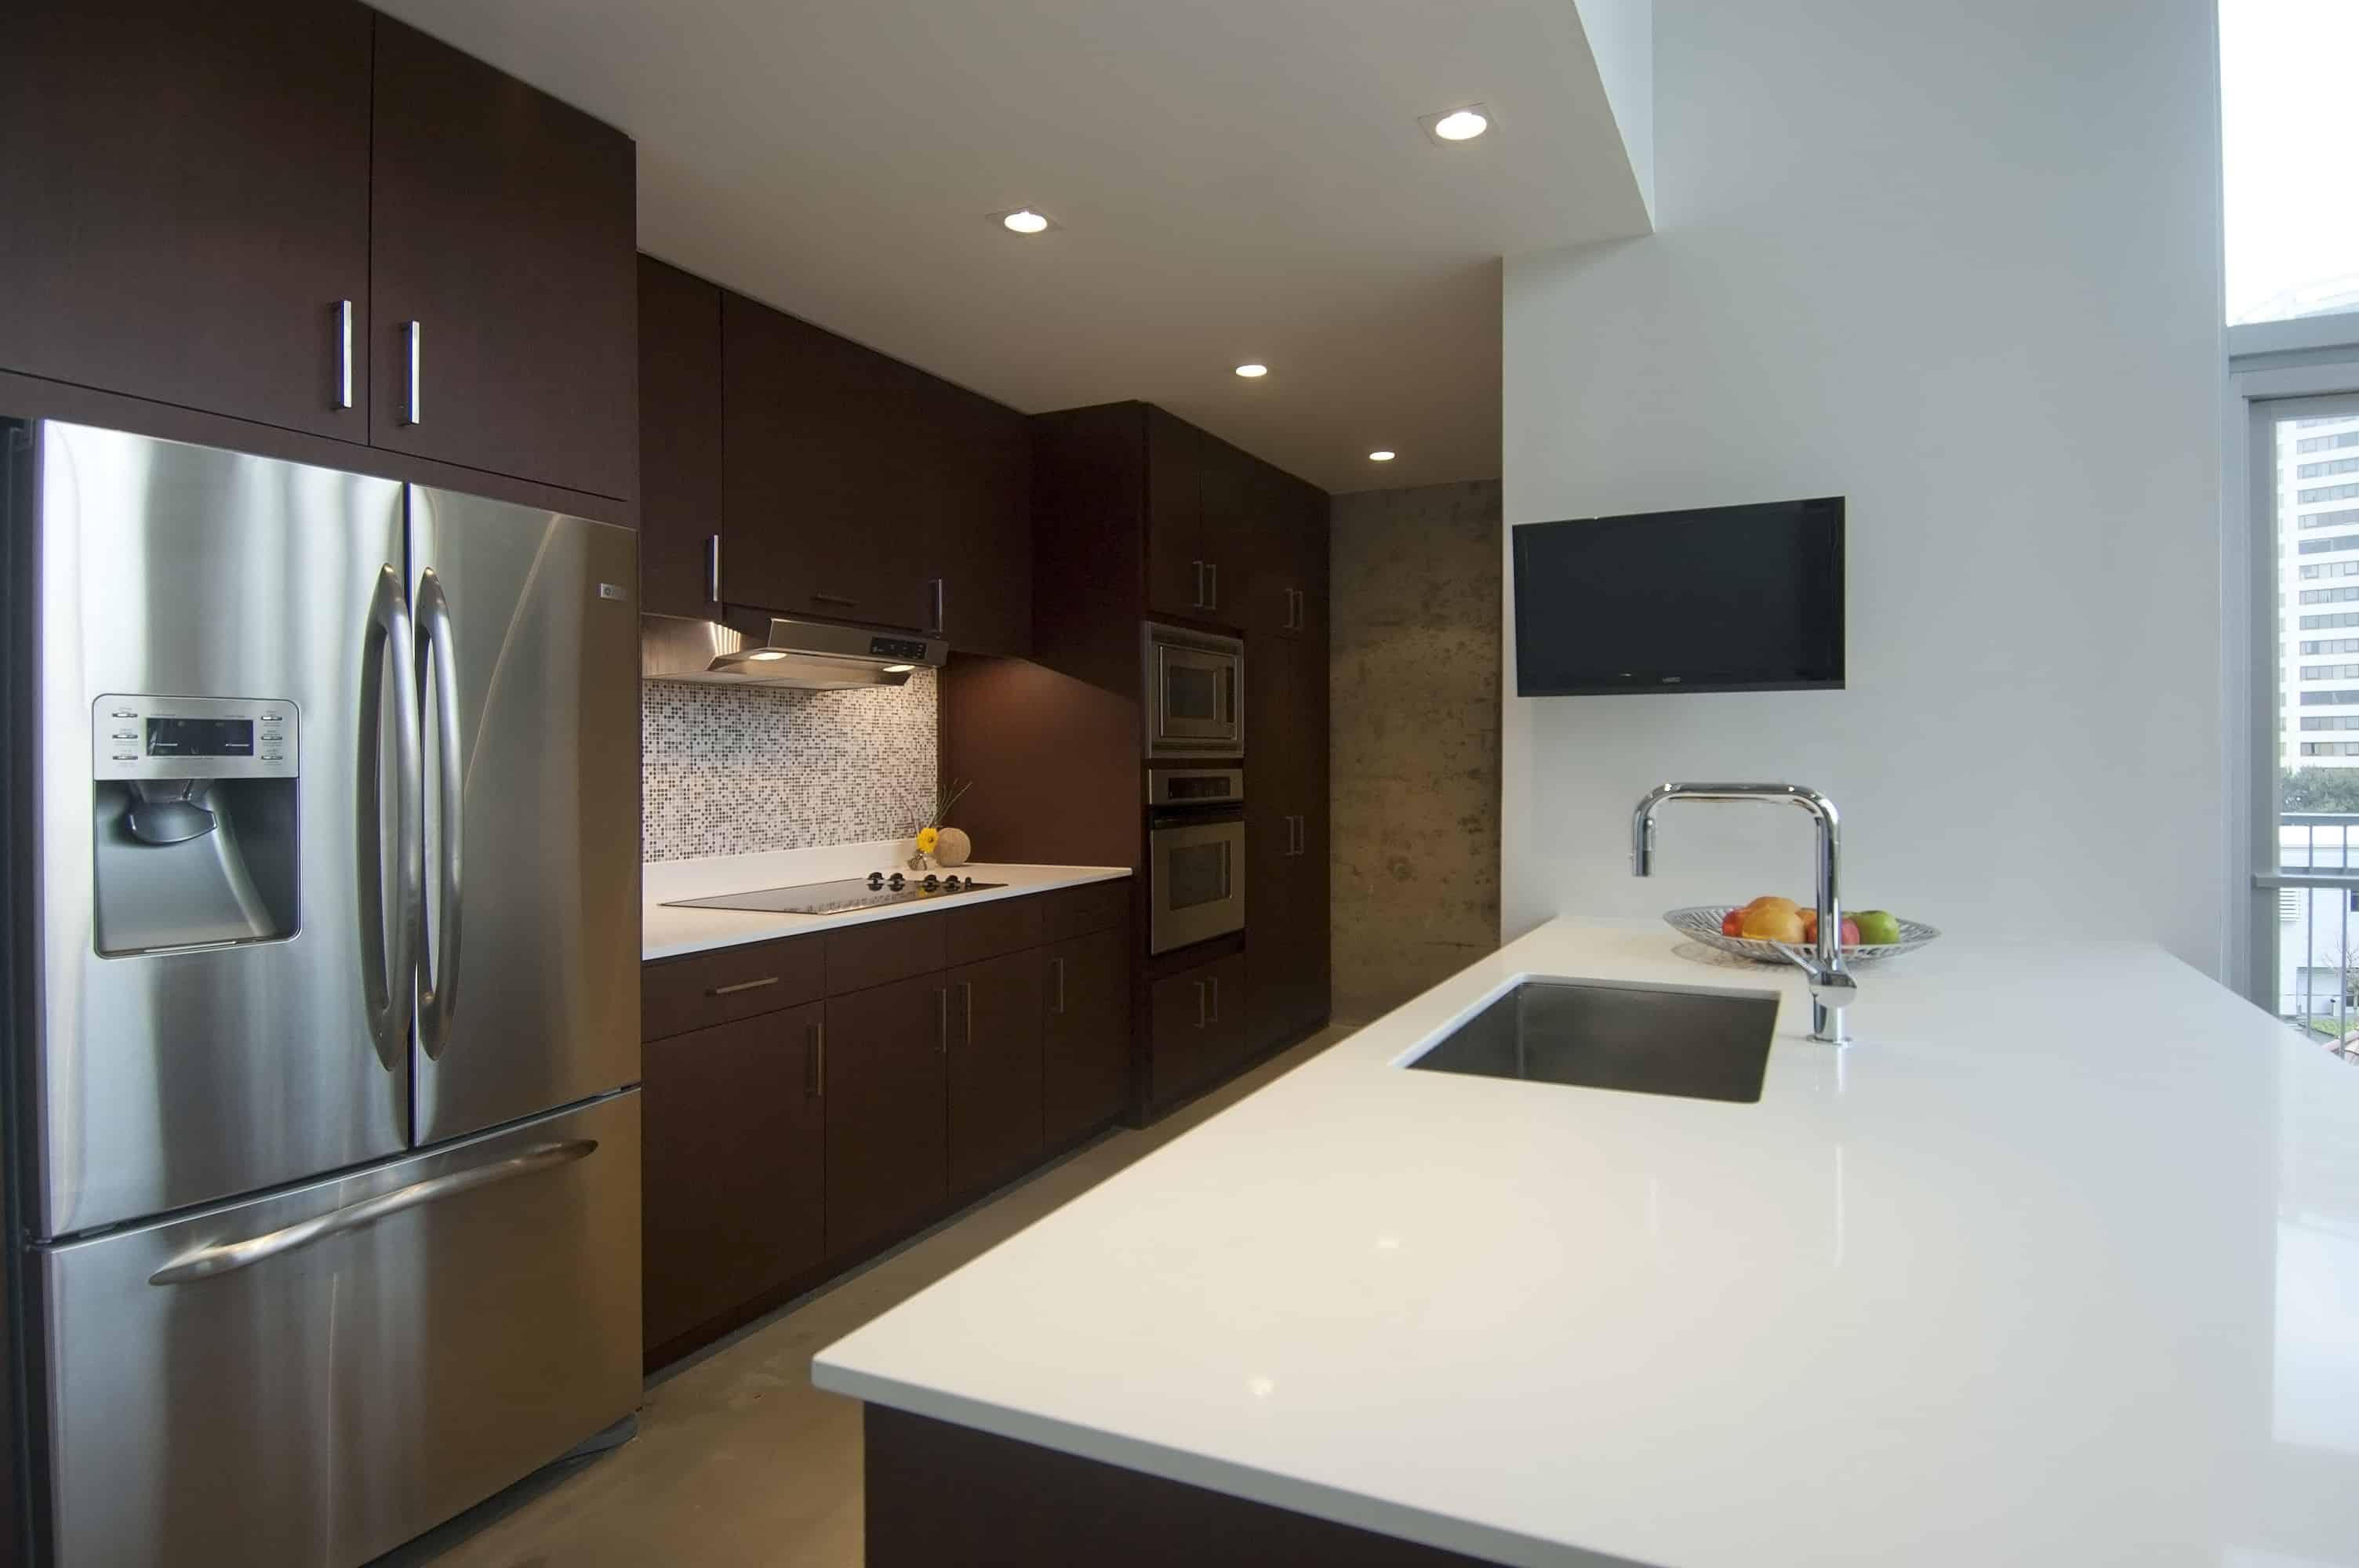 Memorial Luxury Loft bedroom industrial mid century furnishings walnut wood kitchen